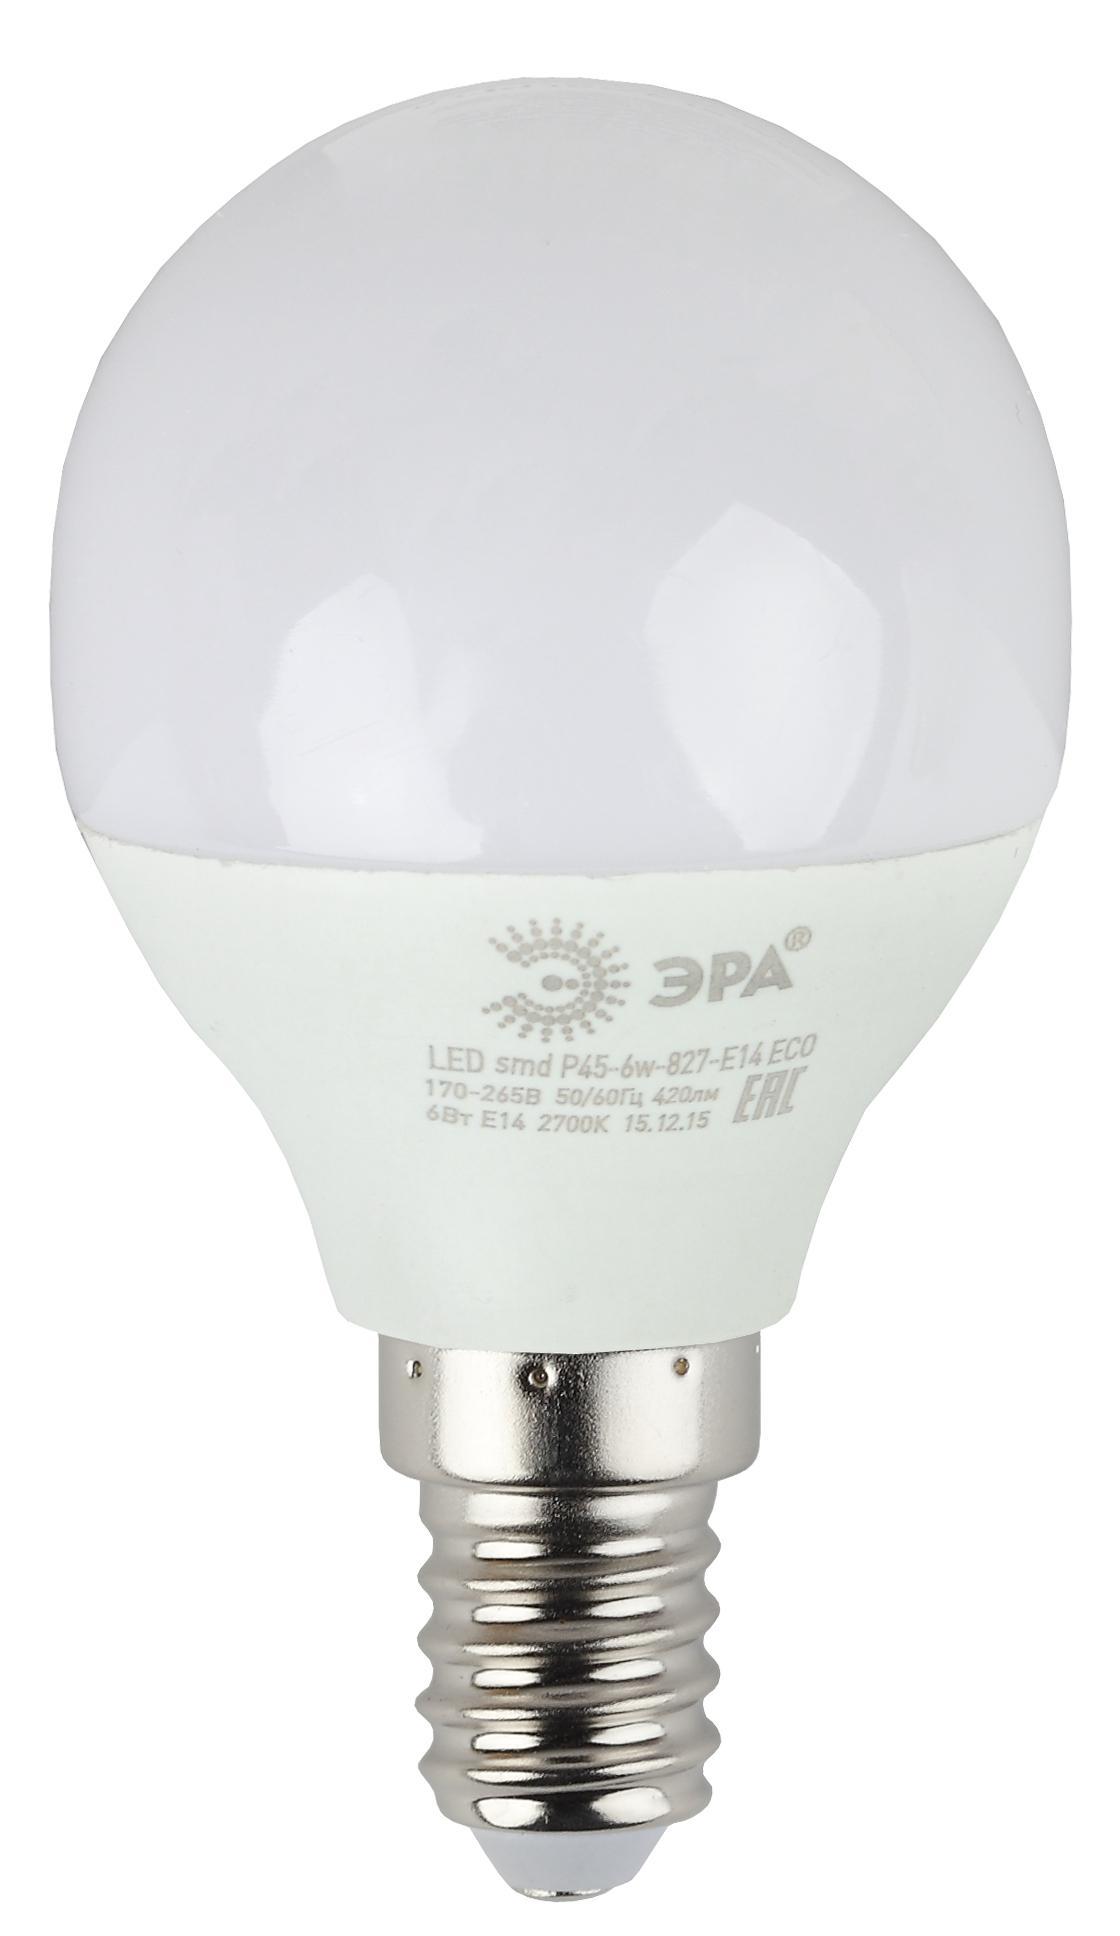 Лампа светодиодная ЭРА Led smd Р45-6w-840-e14 eco цена